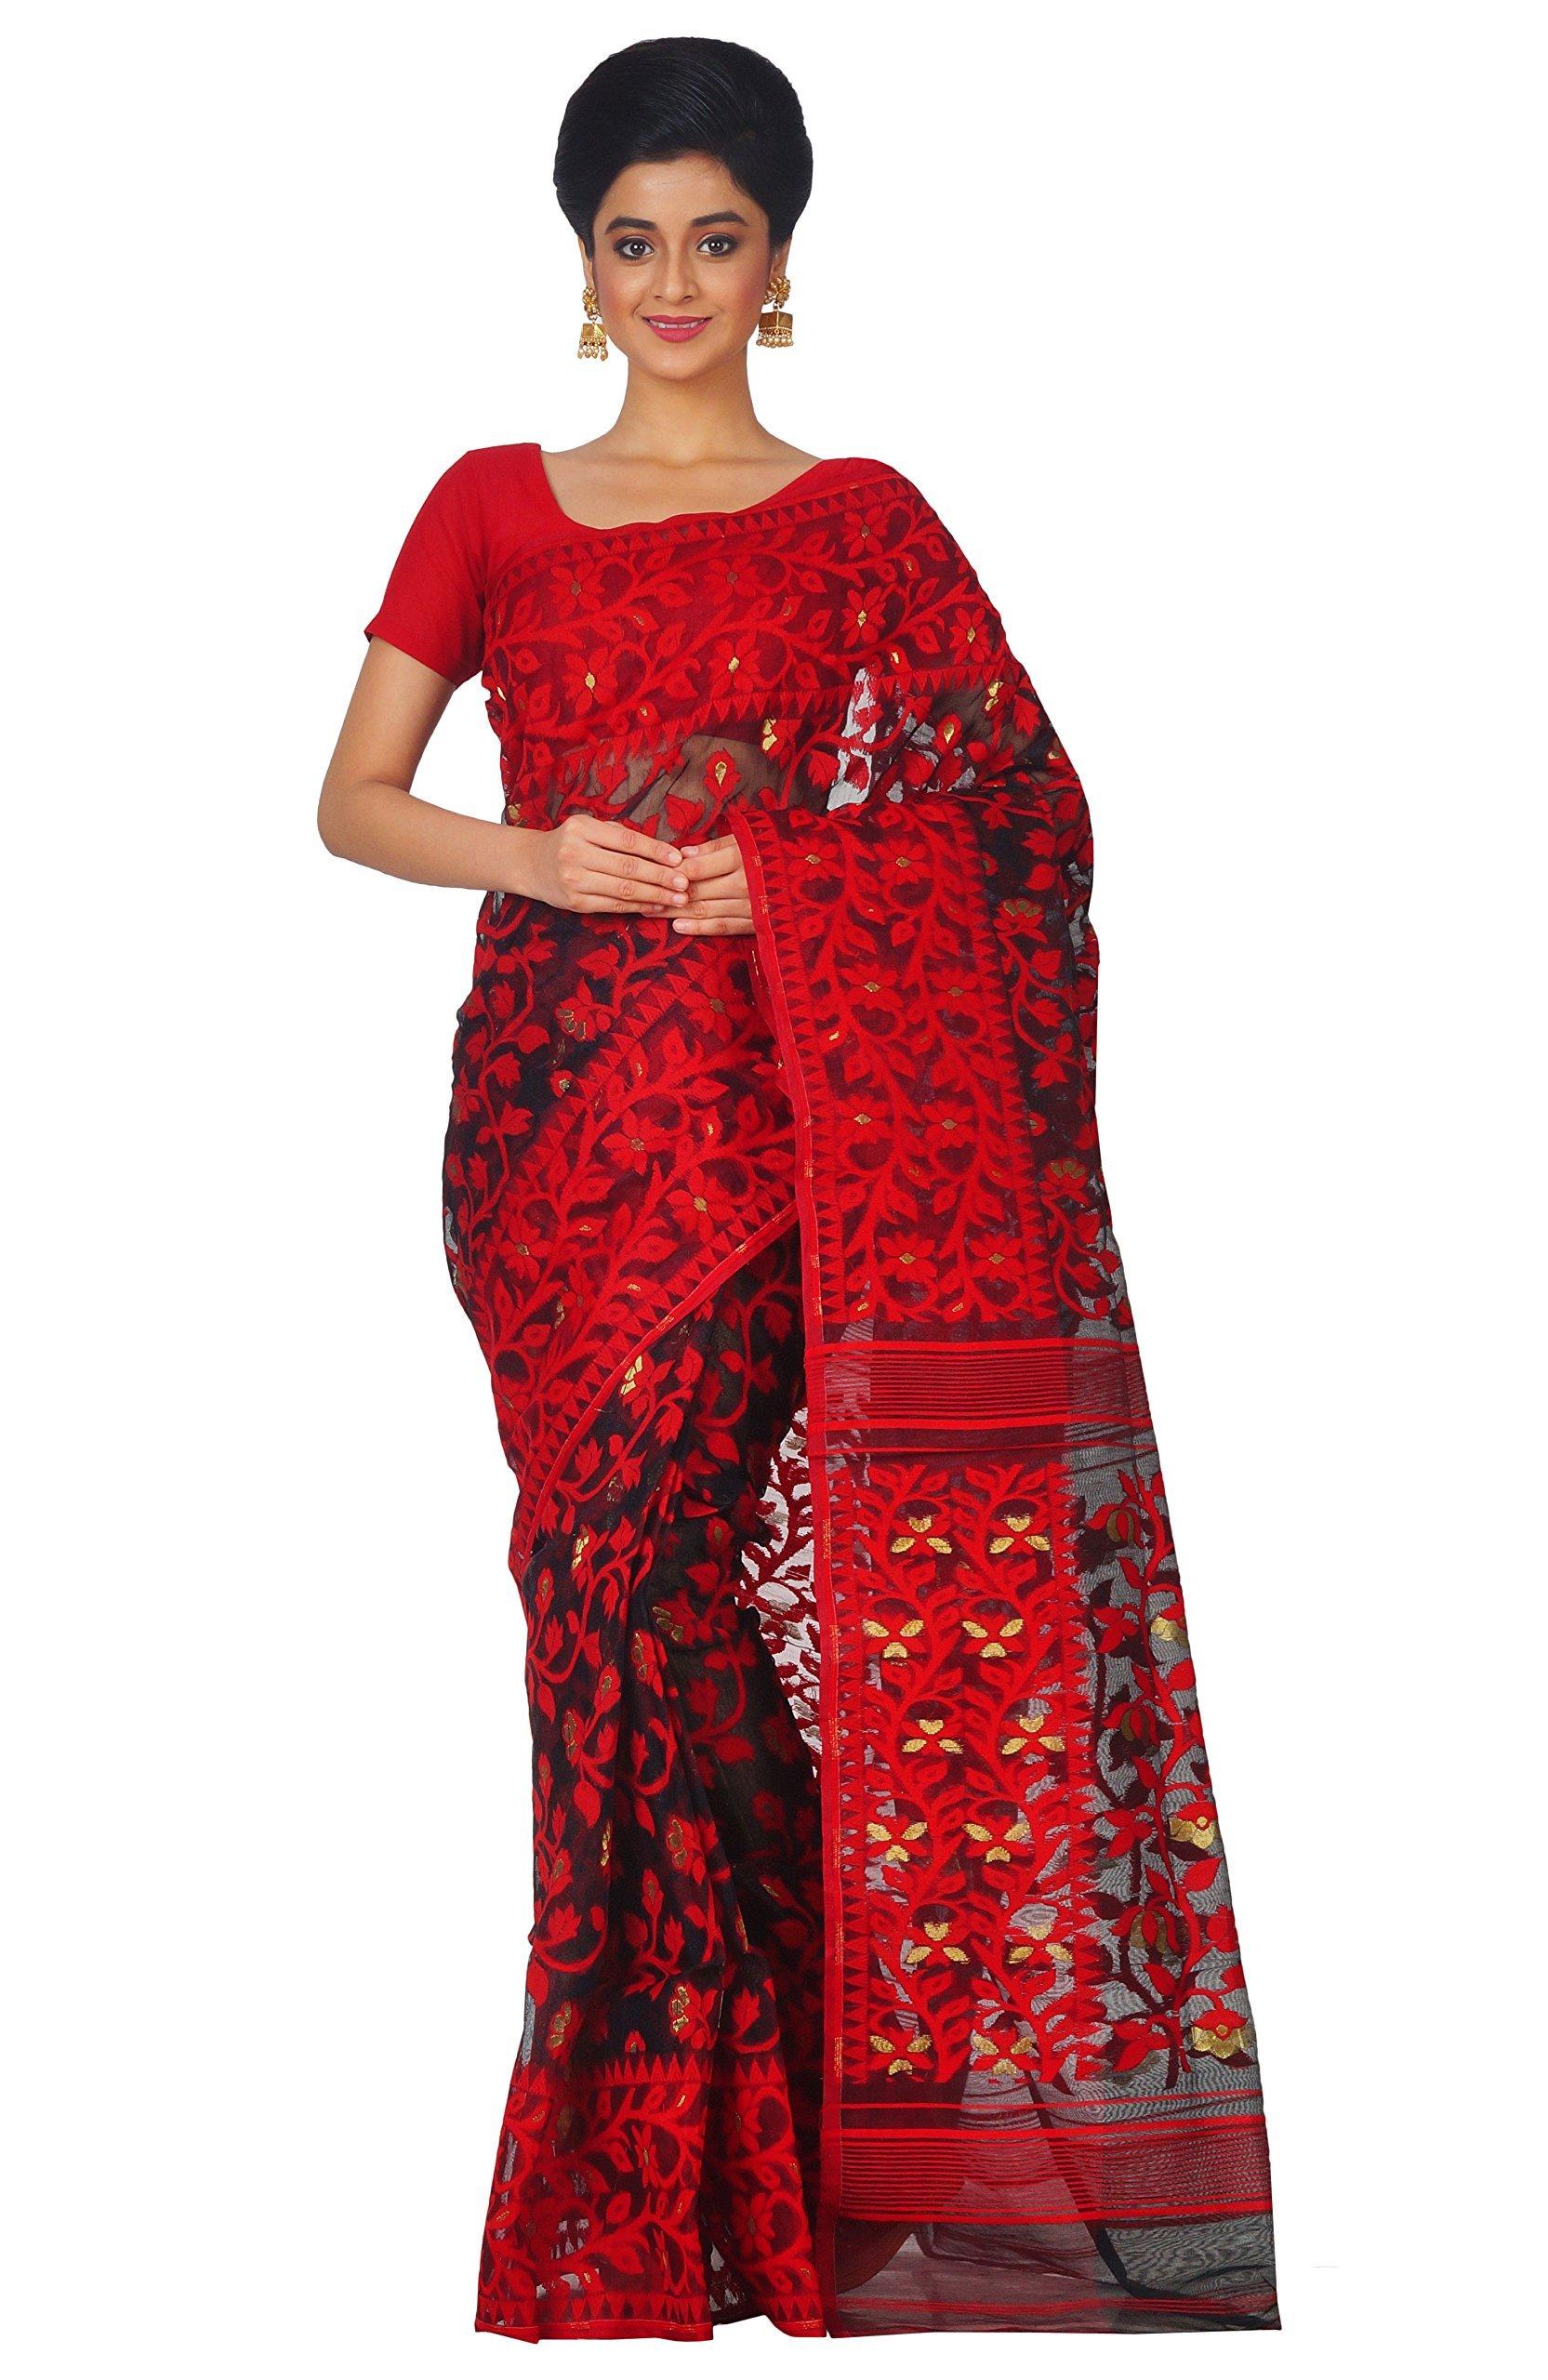 RLBFashion Women's Cotton Silk Handloom Dhakai Jamdani Saree (Red & Black)